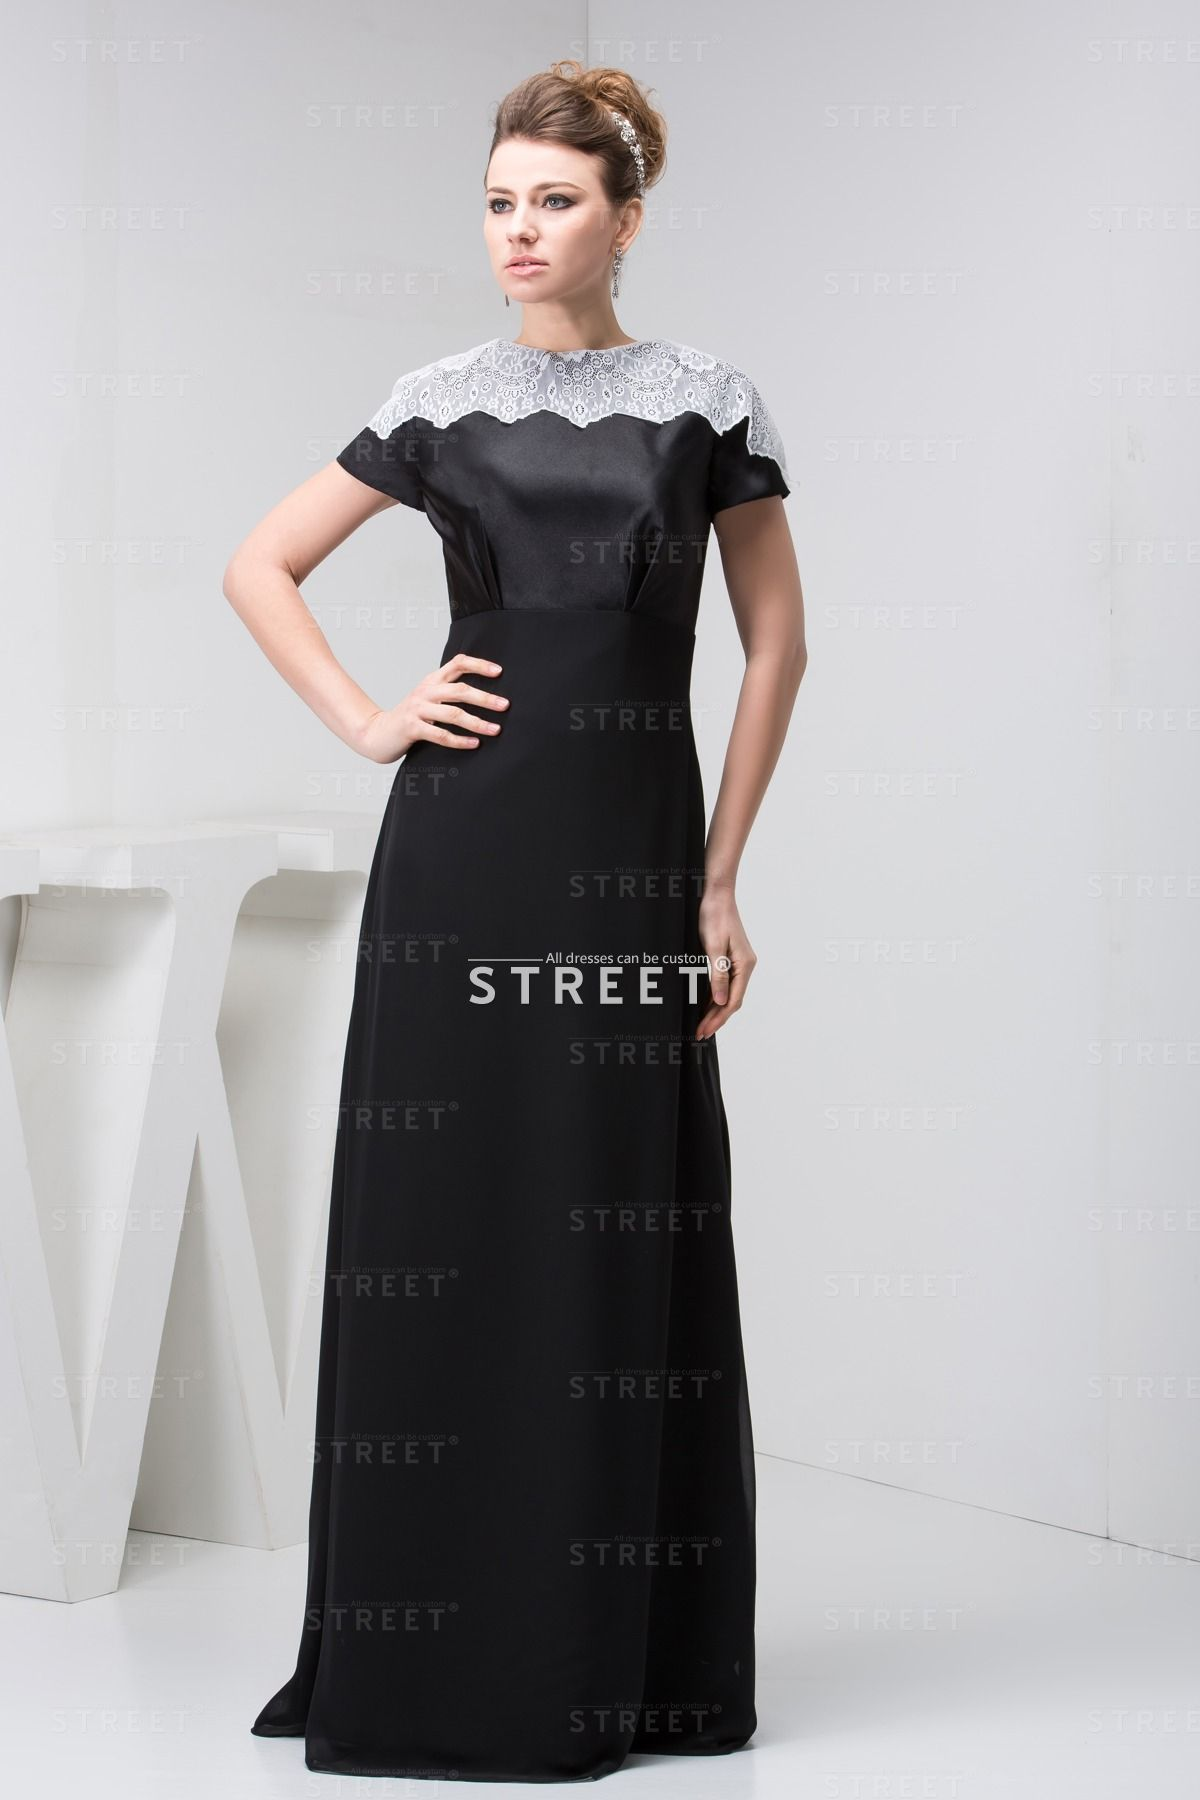 Best Black Conservative Plain Sweep Train Women Wedding Guest Dress black long fashion